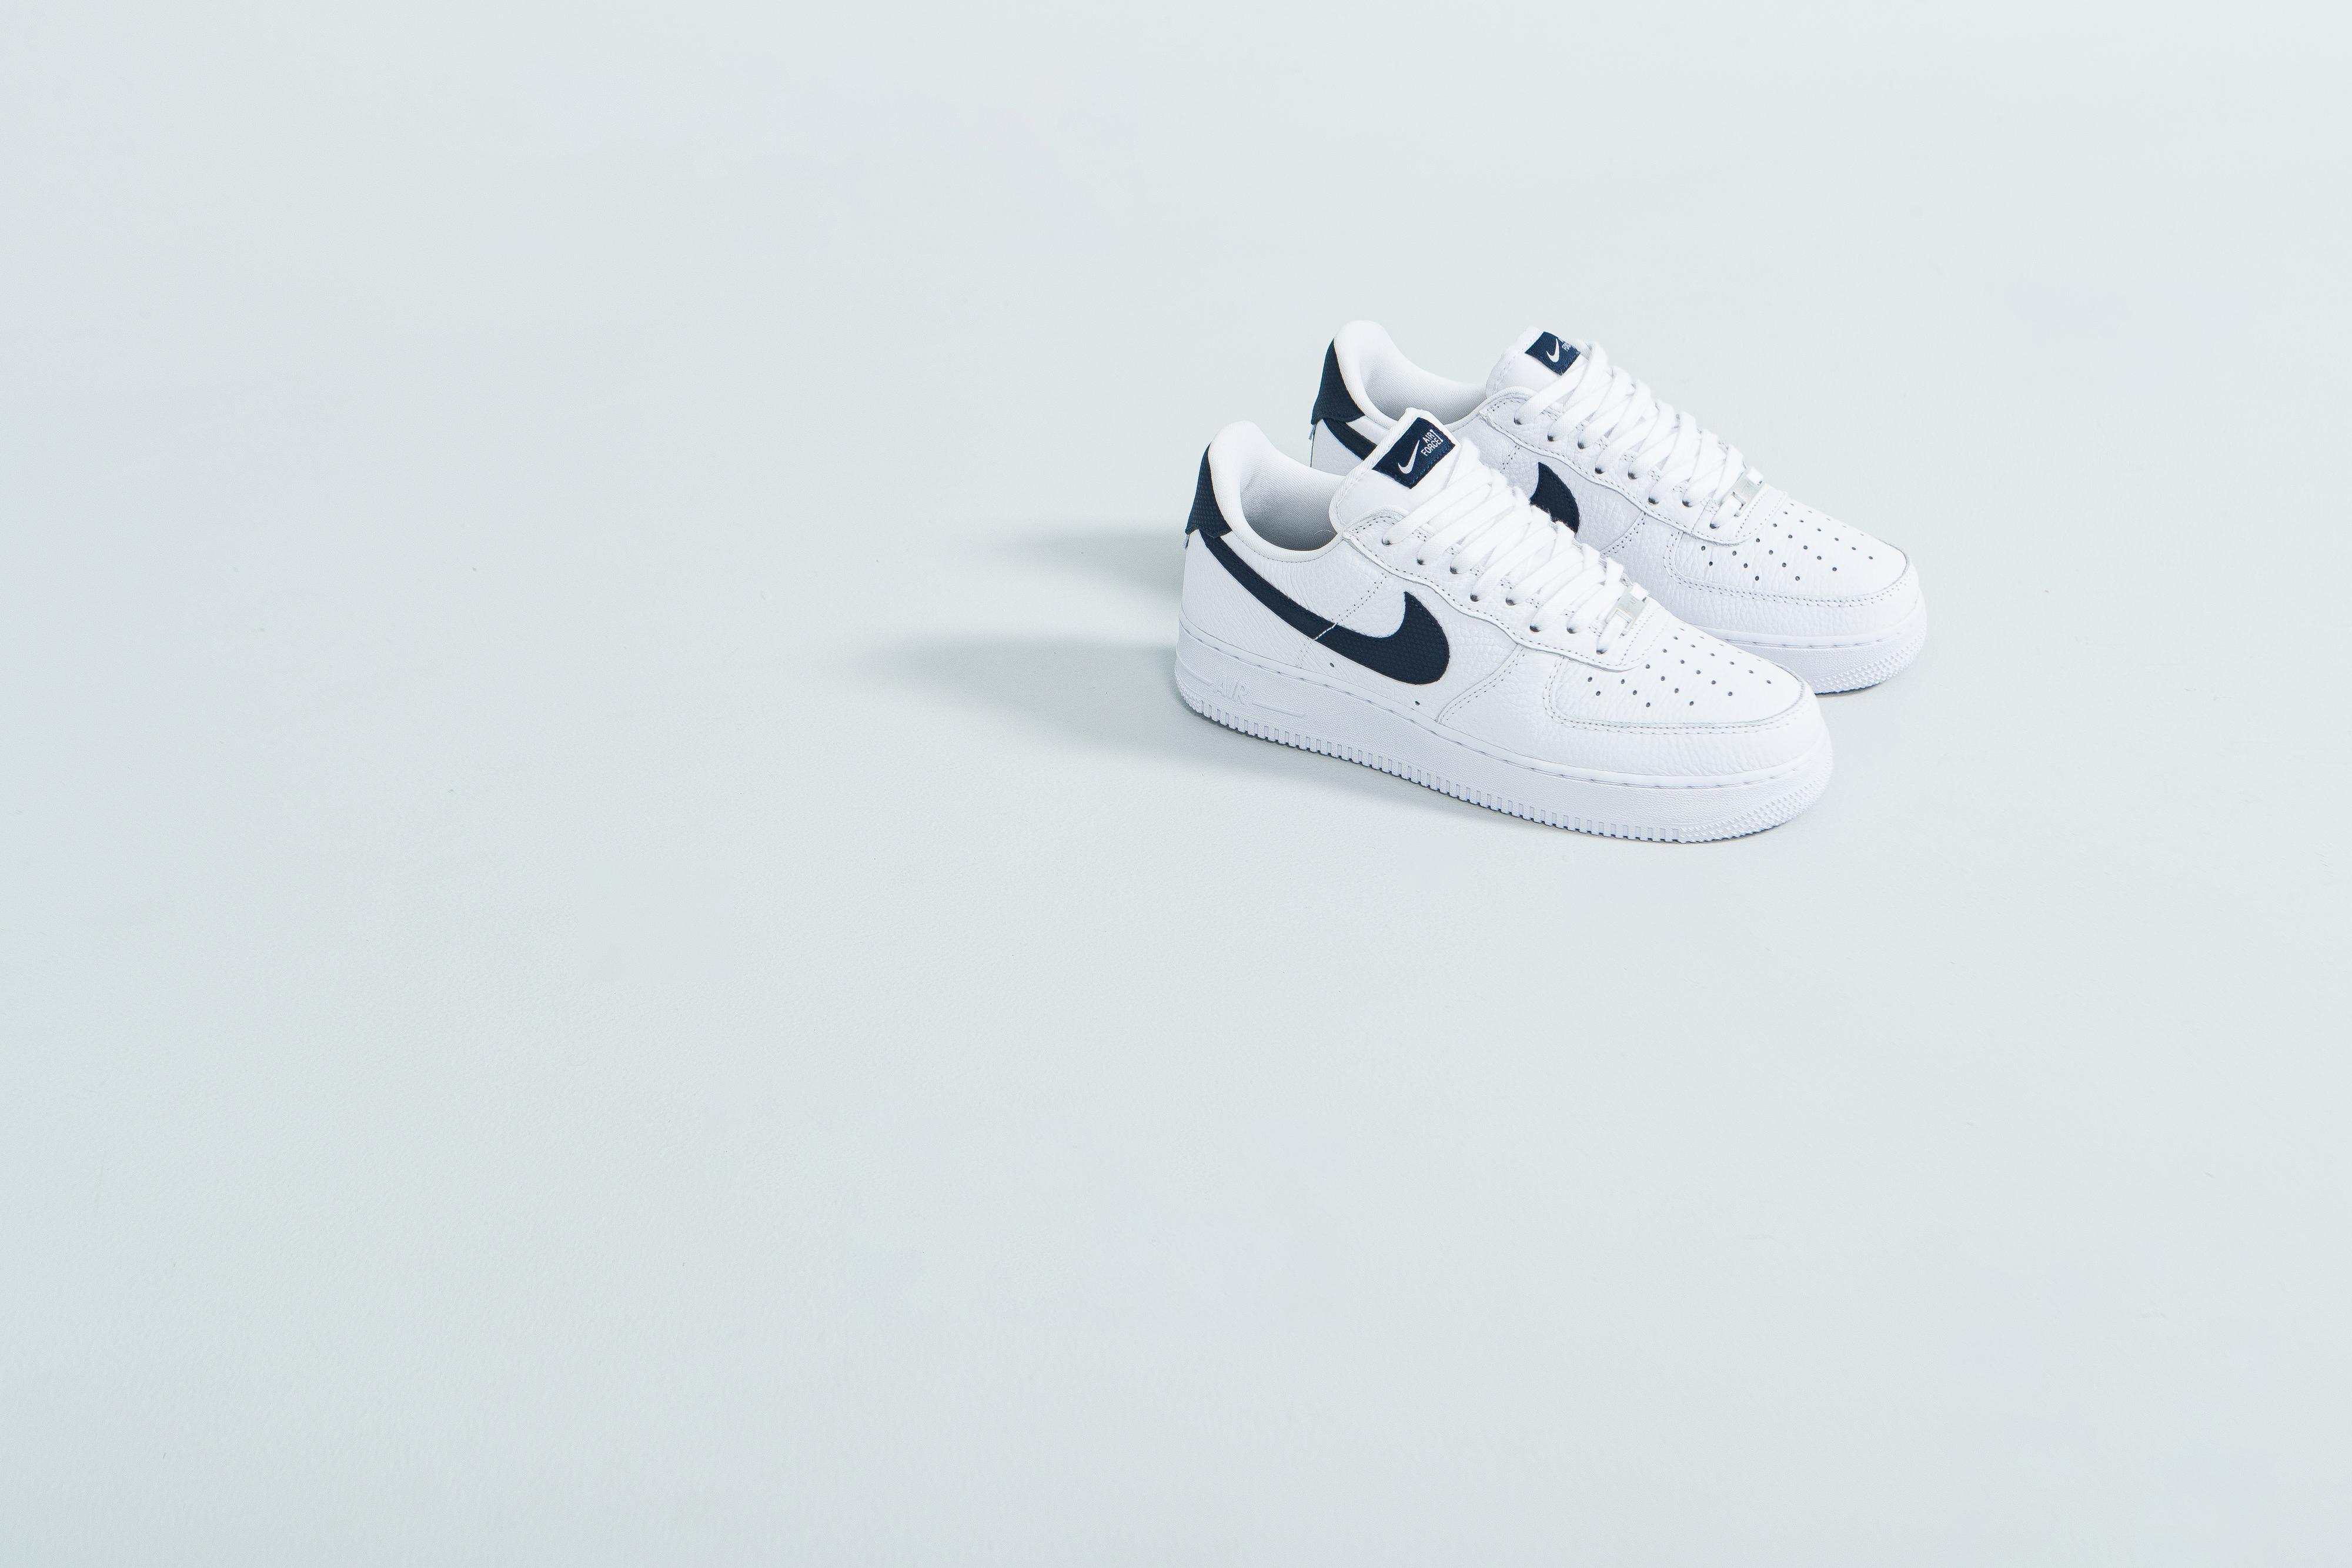 Nike Air Force 1 'Craft' - White/Summit White & White/Obsidian